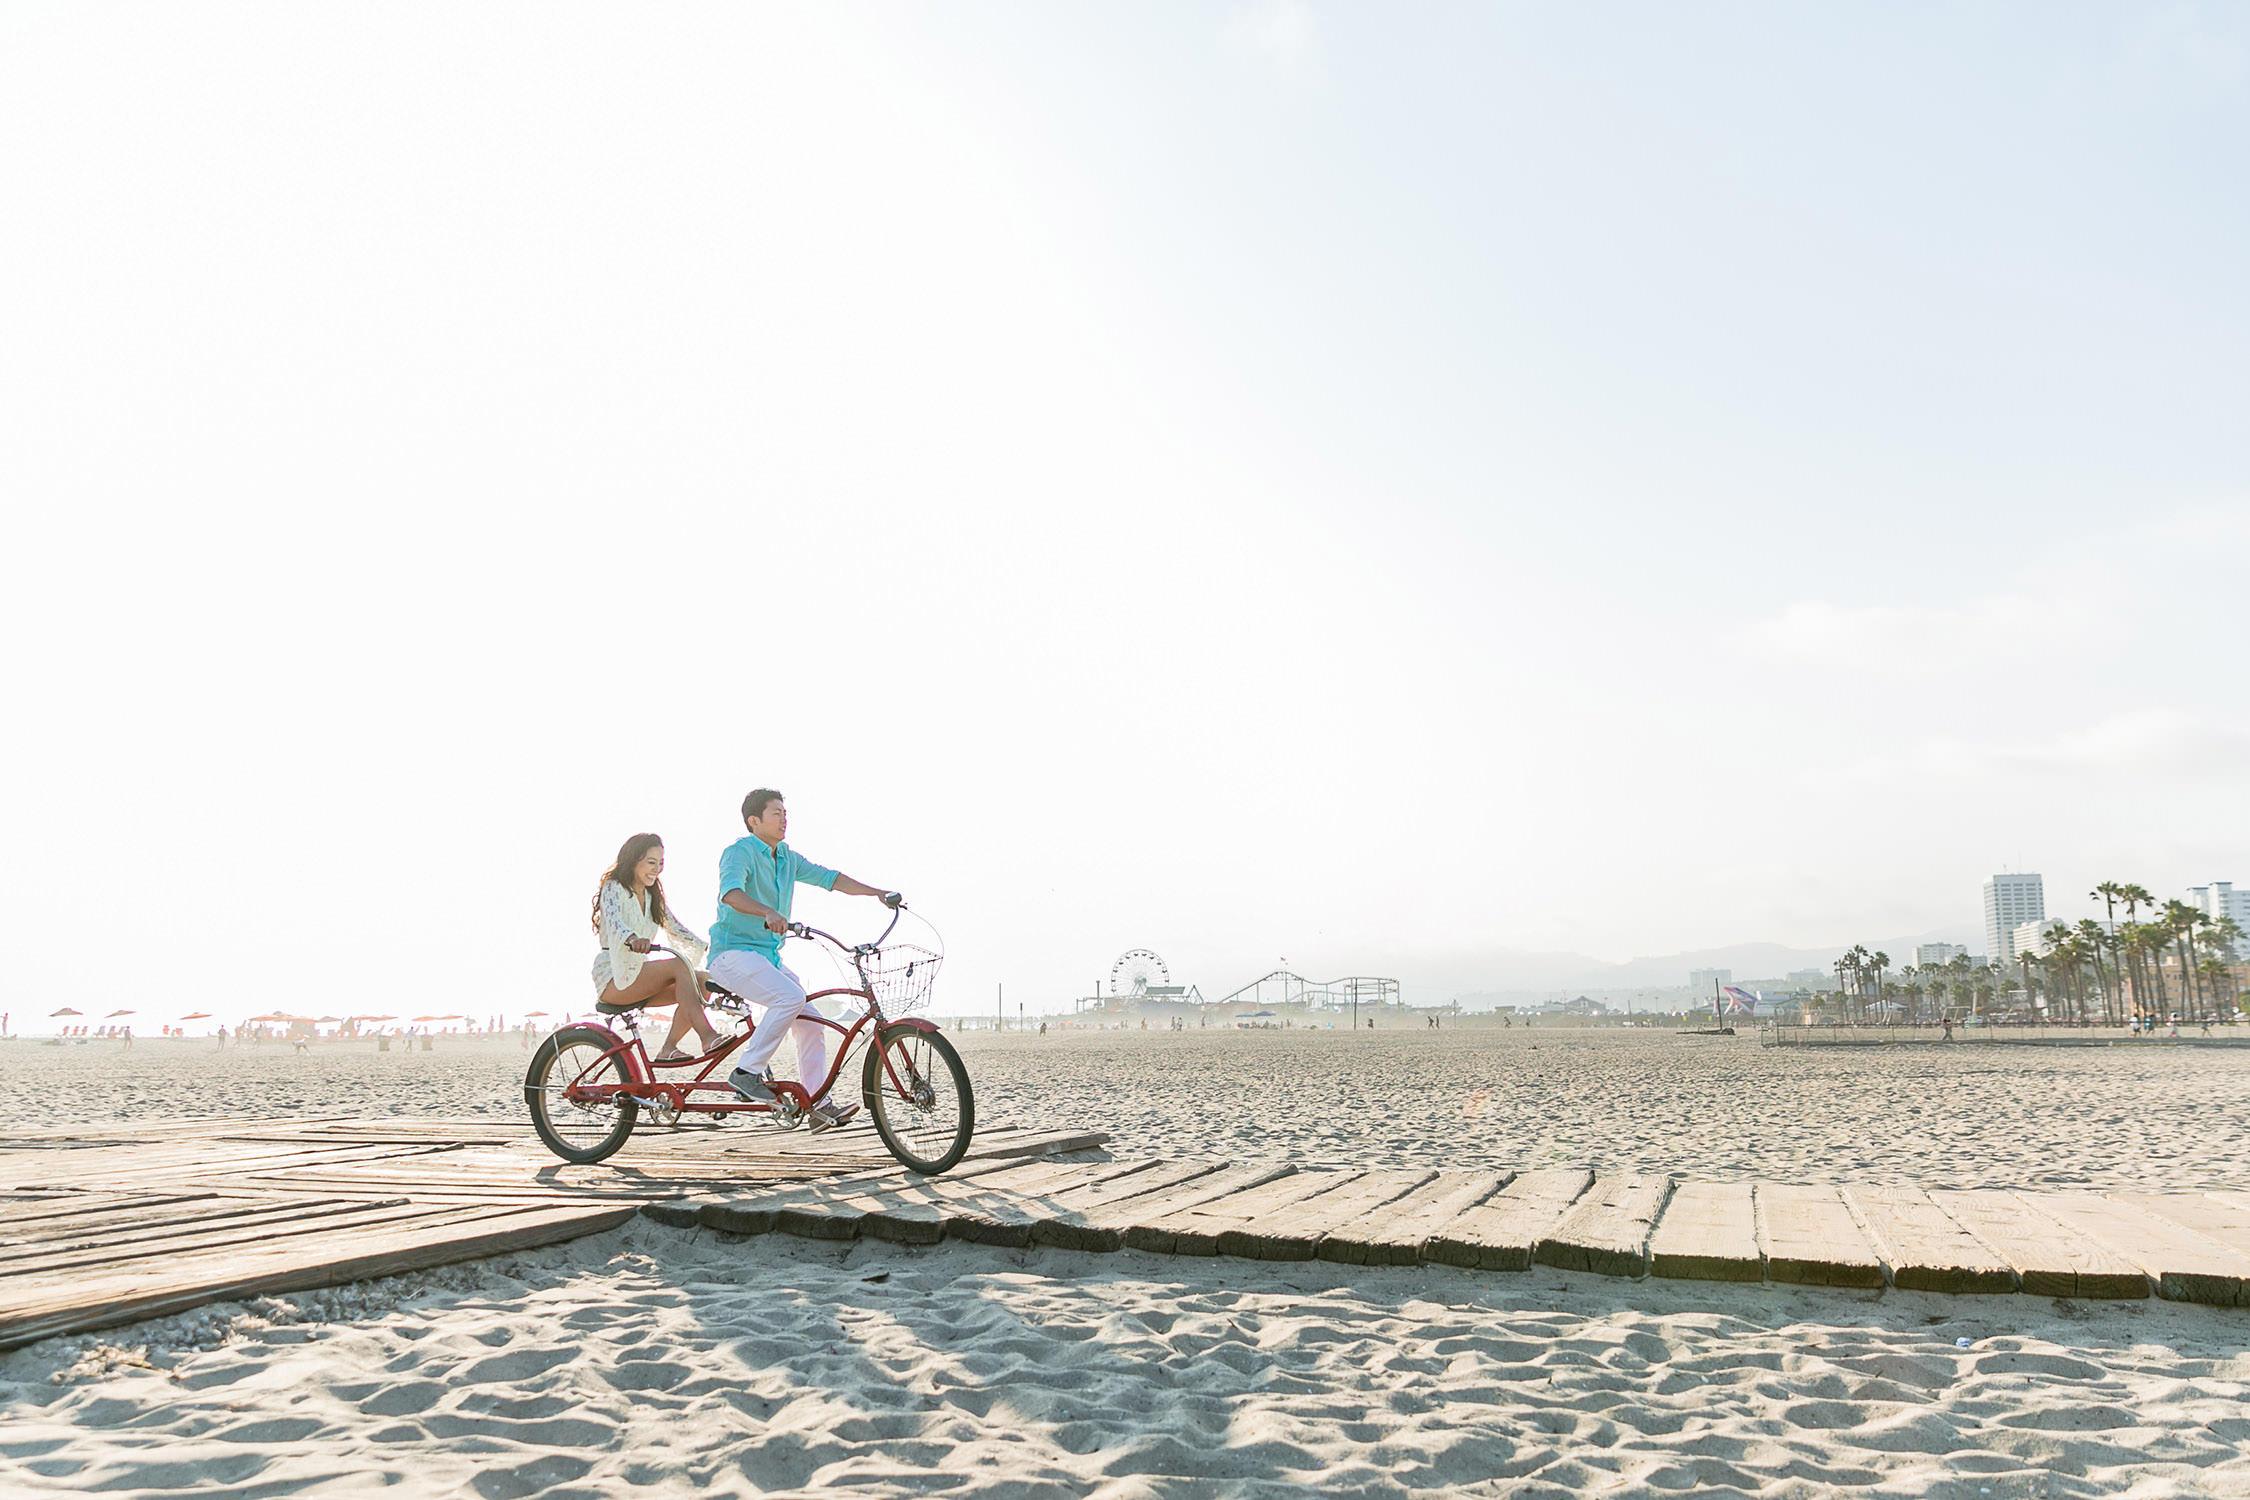 Engagement session on beach bike in Santa Monica beach, Southern California